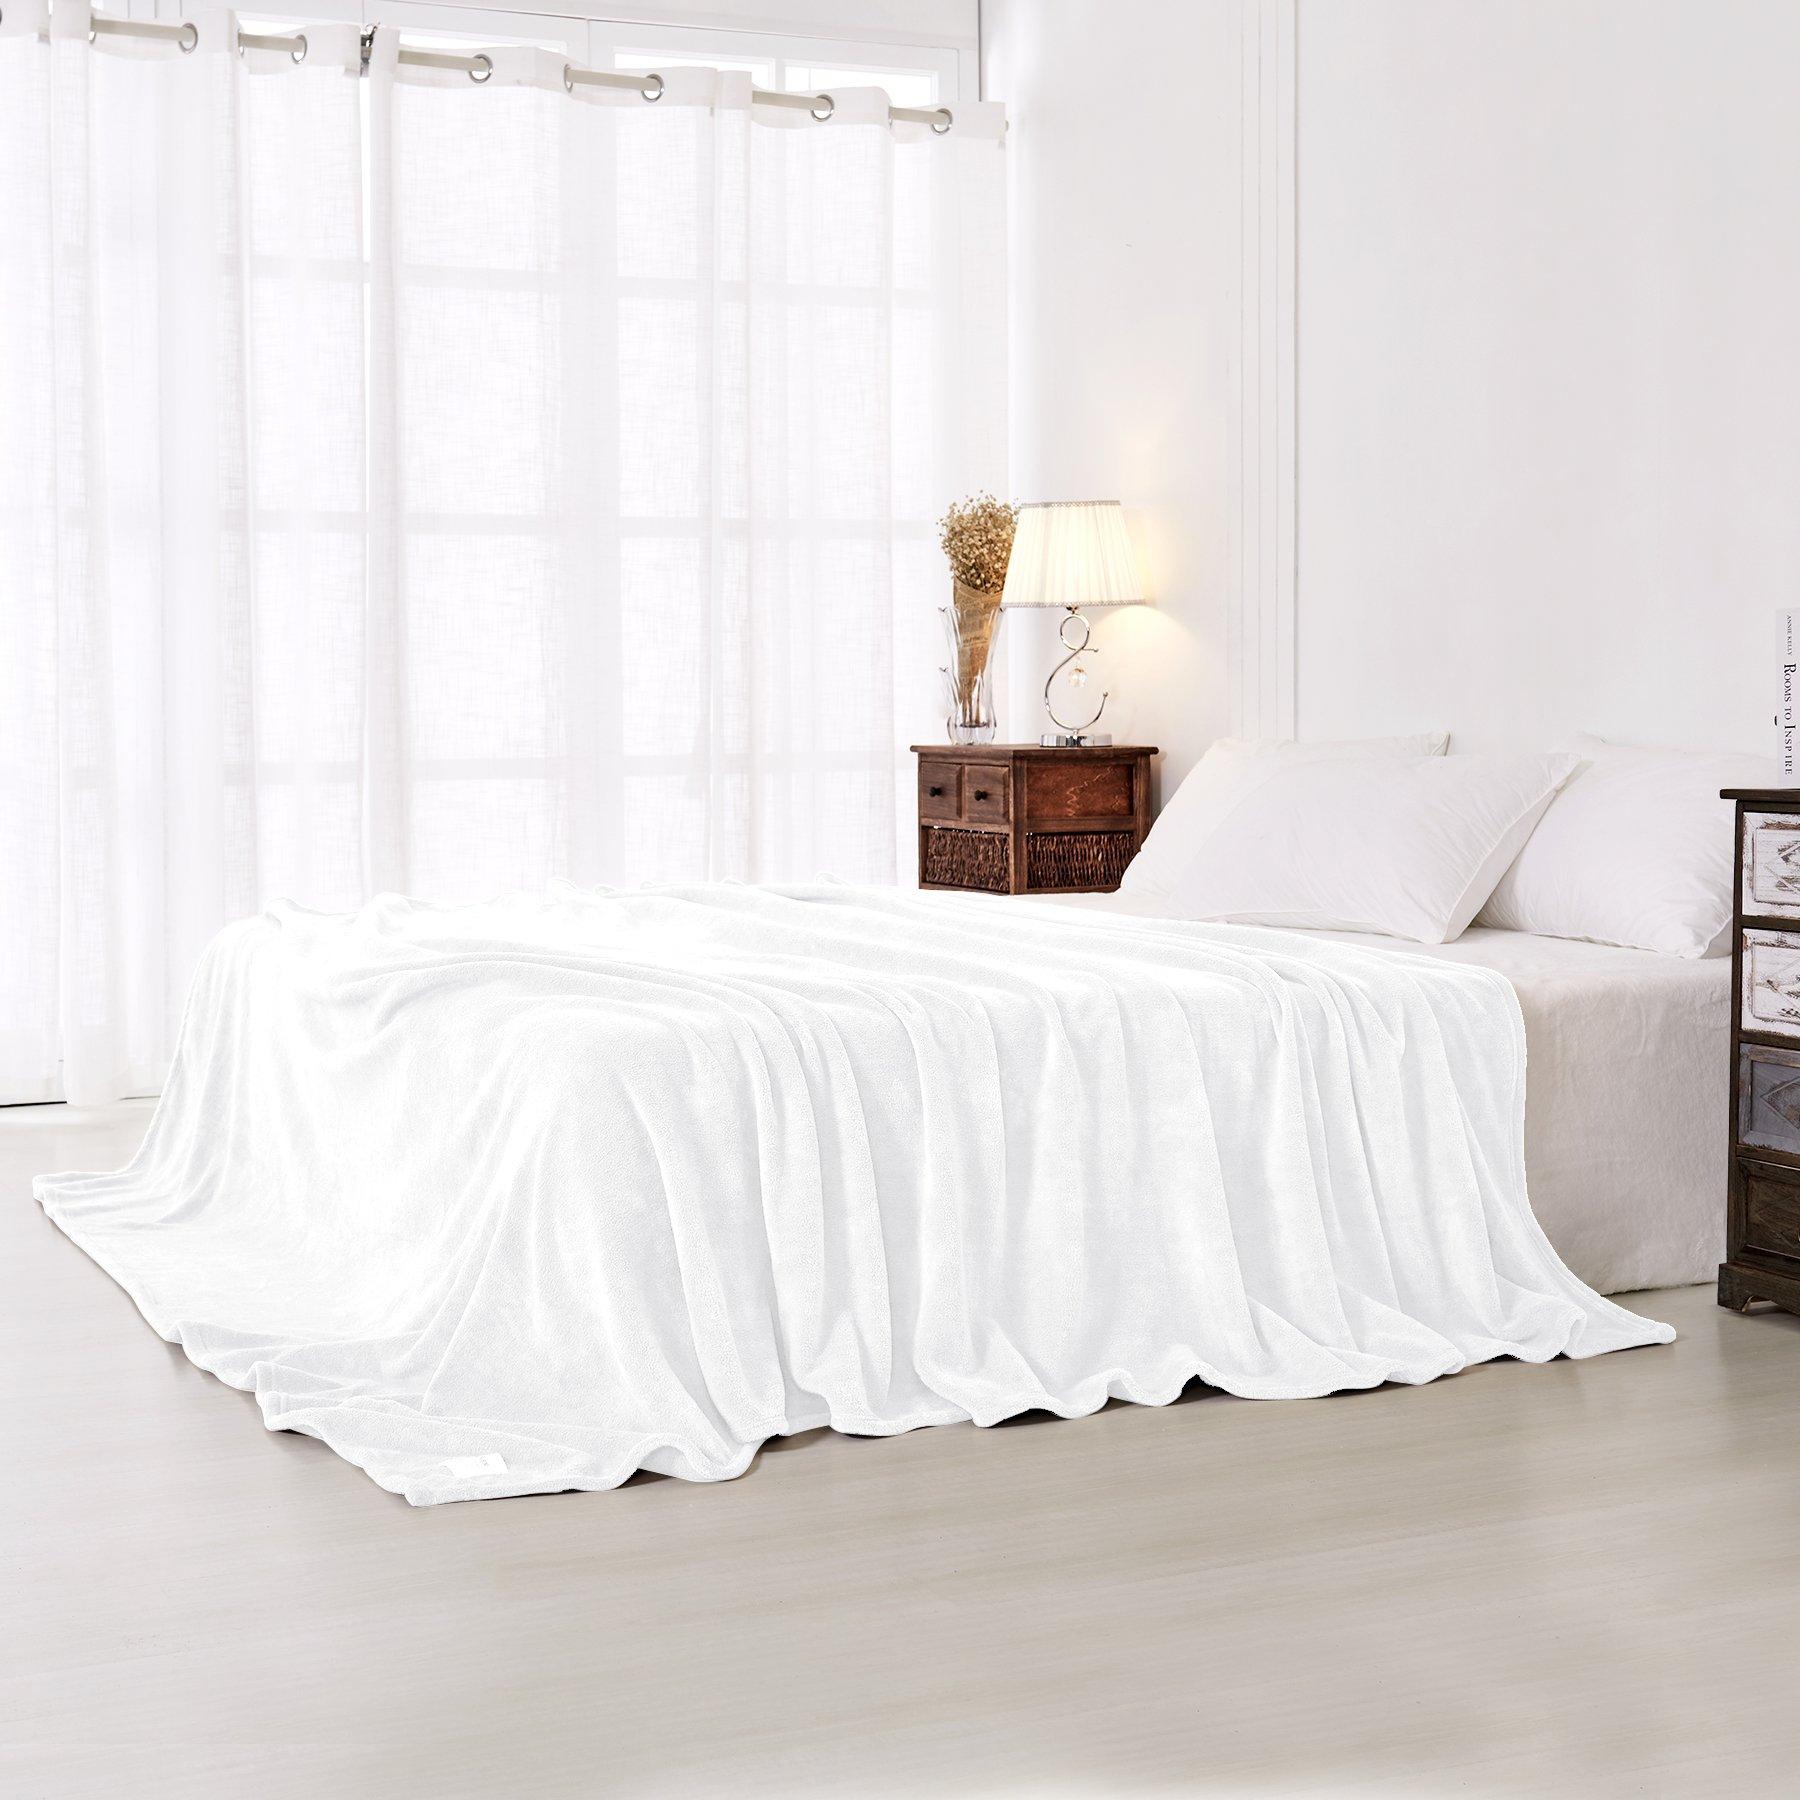 Guken Coral Fleece Super Soft Throw Blanket Warm Lightweight All Season Microfiber Throw Blanket for Bed or Couch (Queen, White)